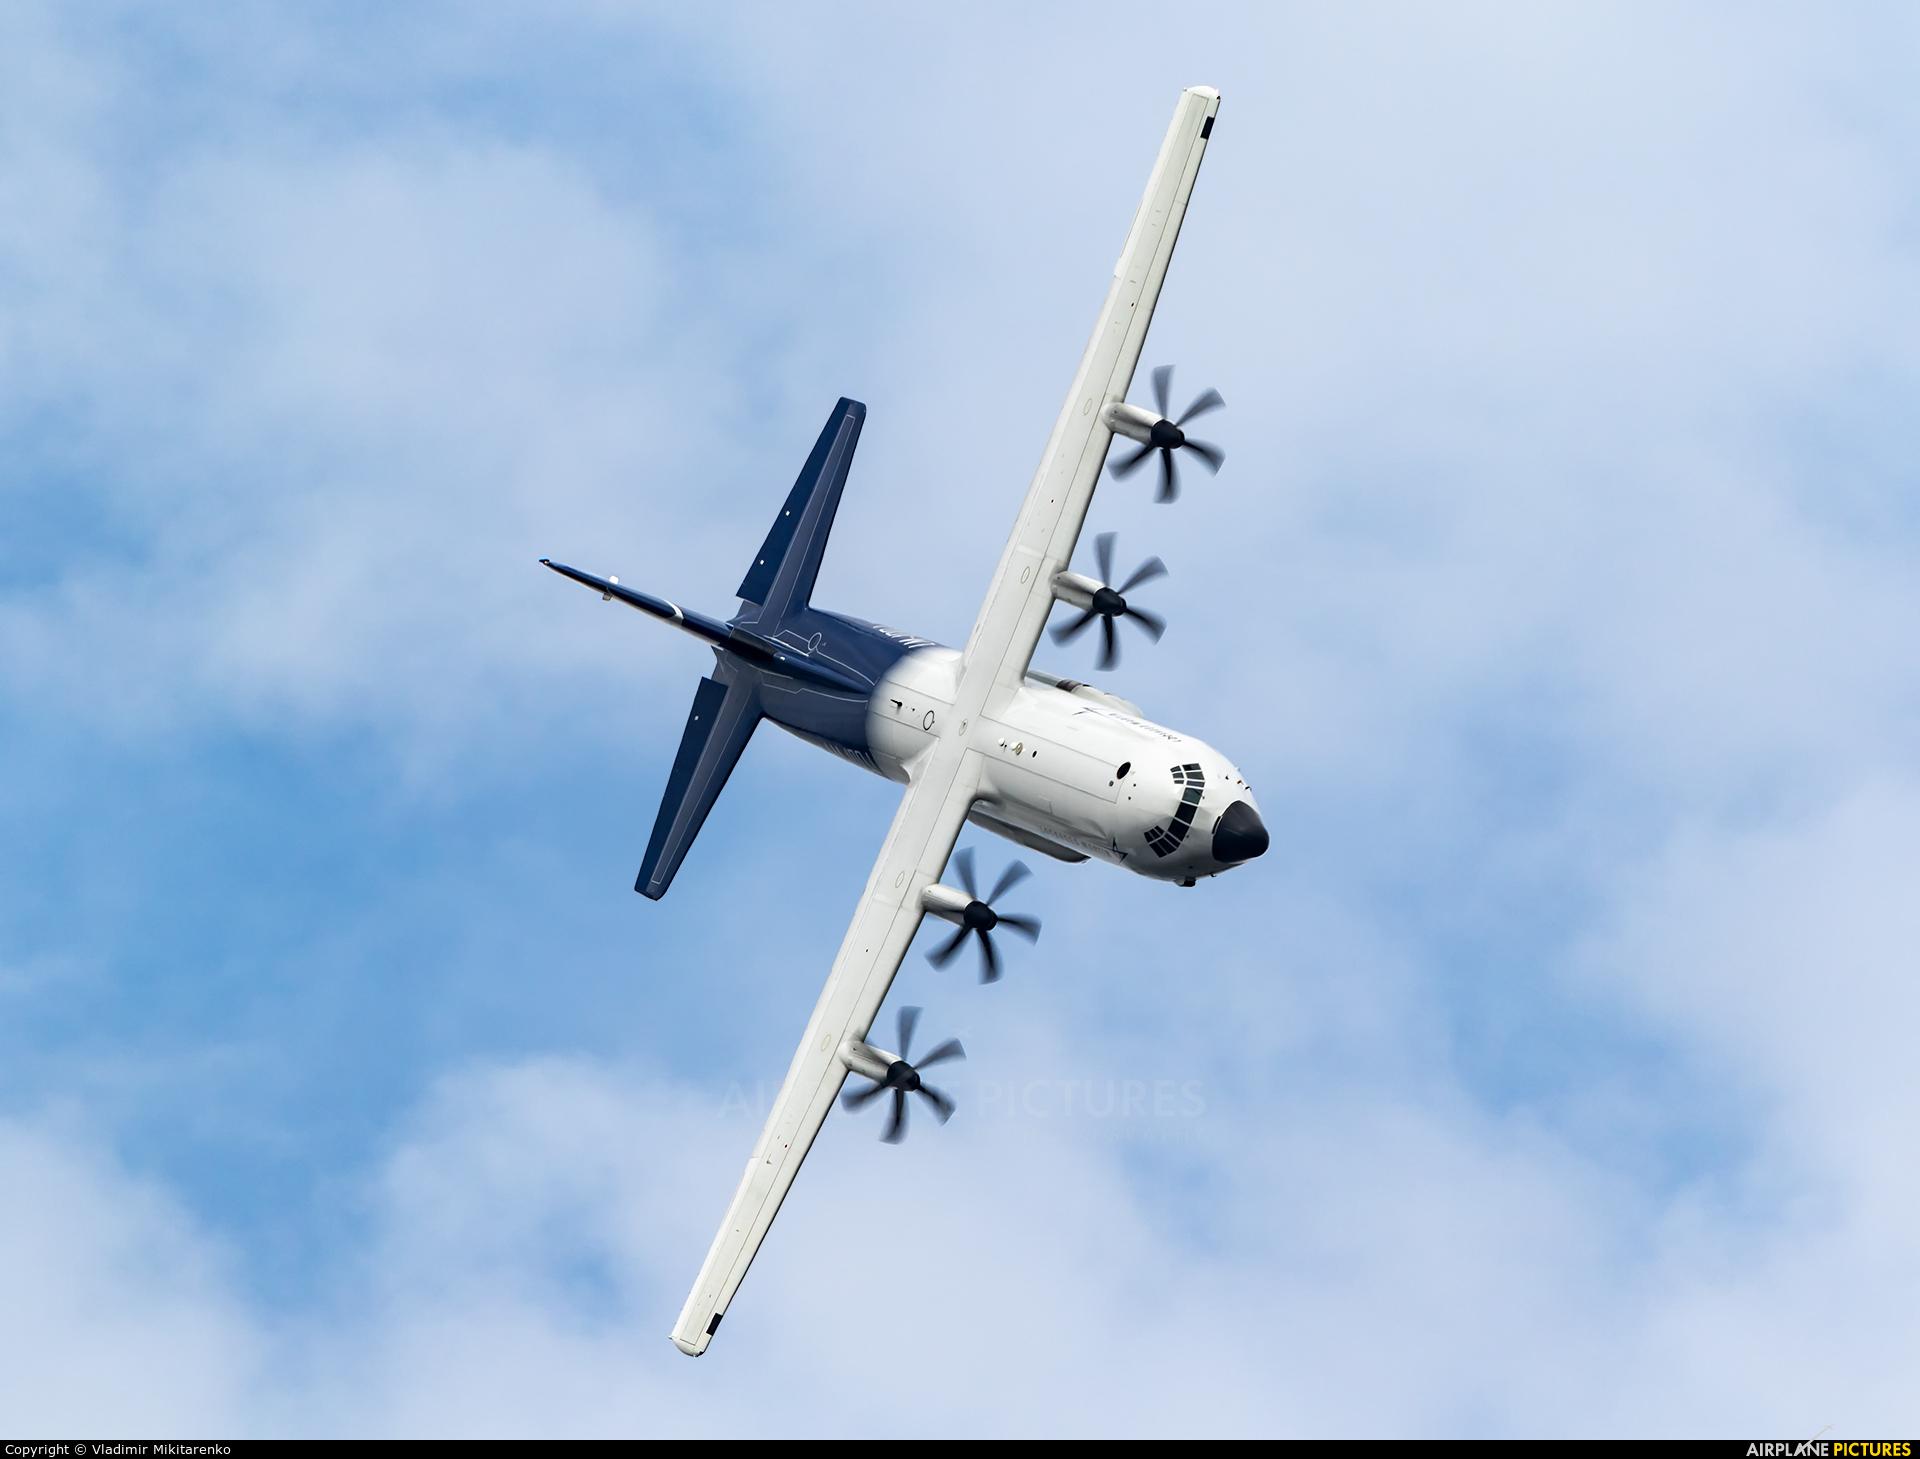 Lockheed Martin N5103D aircraft at Farnborough